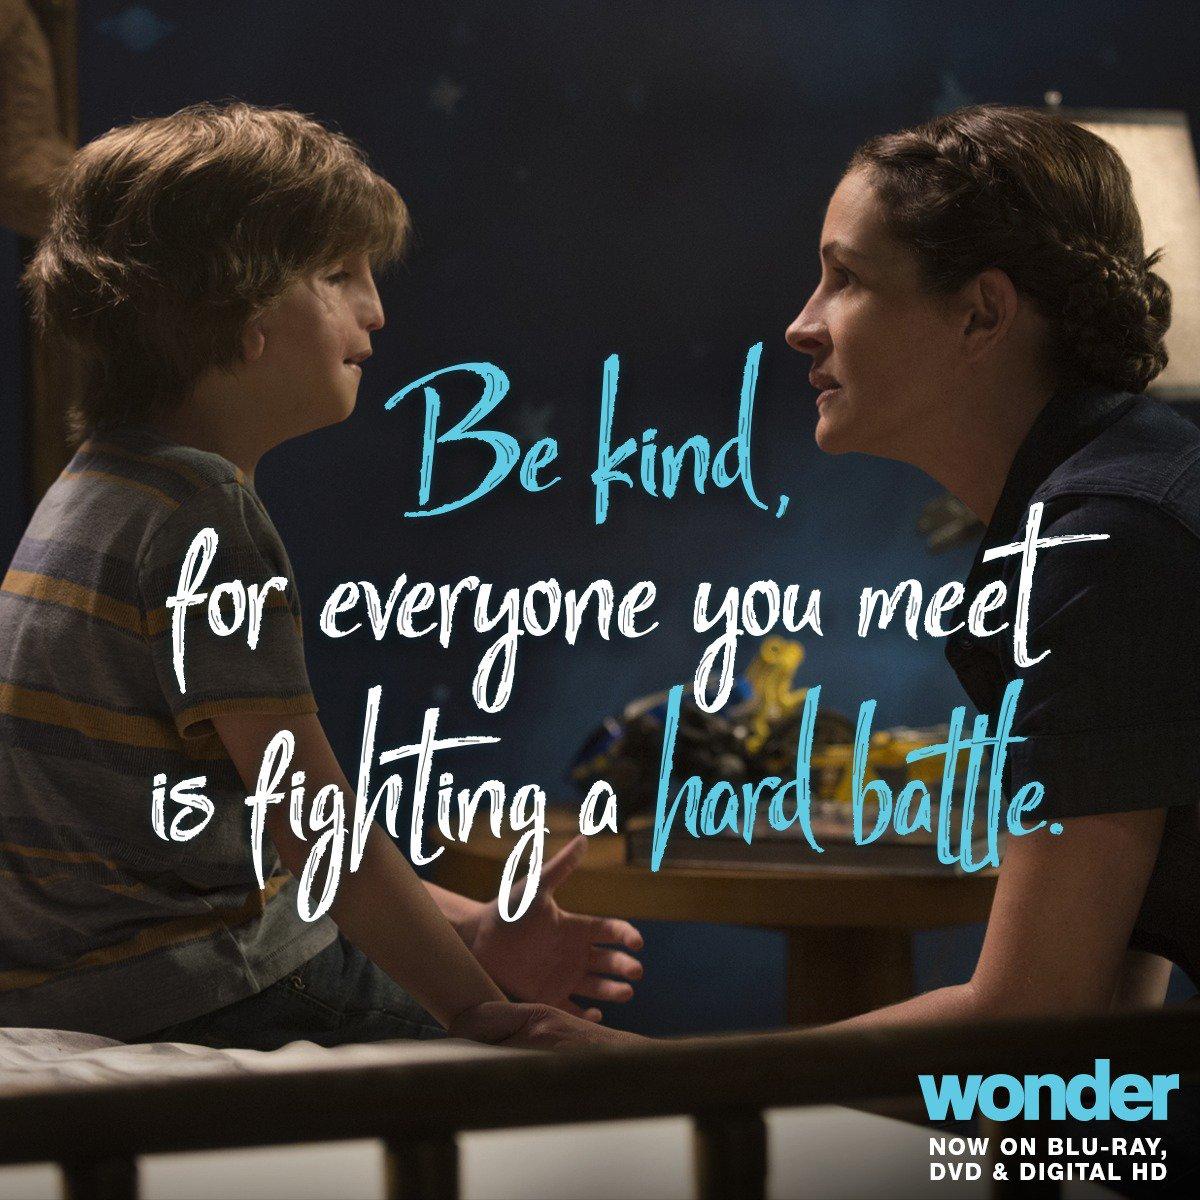 Badri Movie Images With Quotes: Wonder The Movie (@WonderTheMovie)